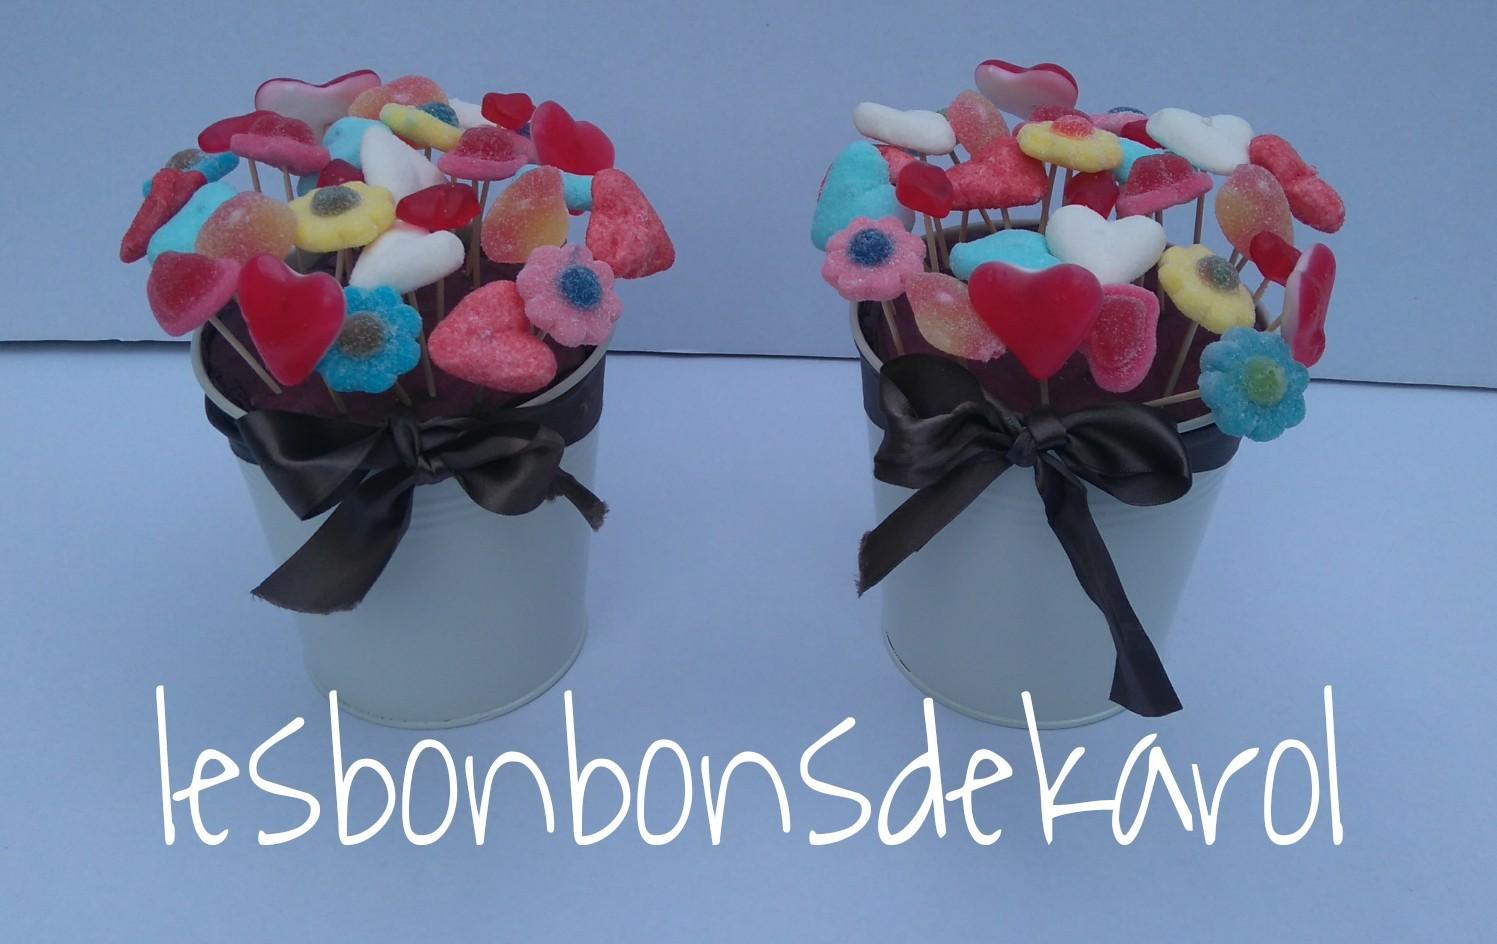 POTEE DE BONBONS - 12,50 € (28 bonbons - pot métal existe aussi en bleu, vert et rose)